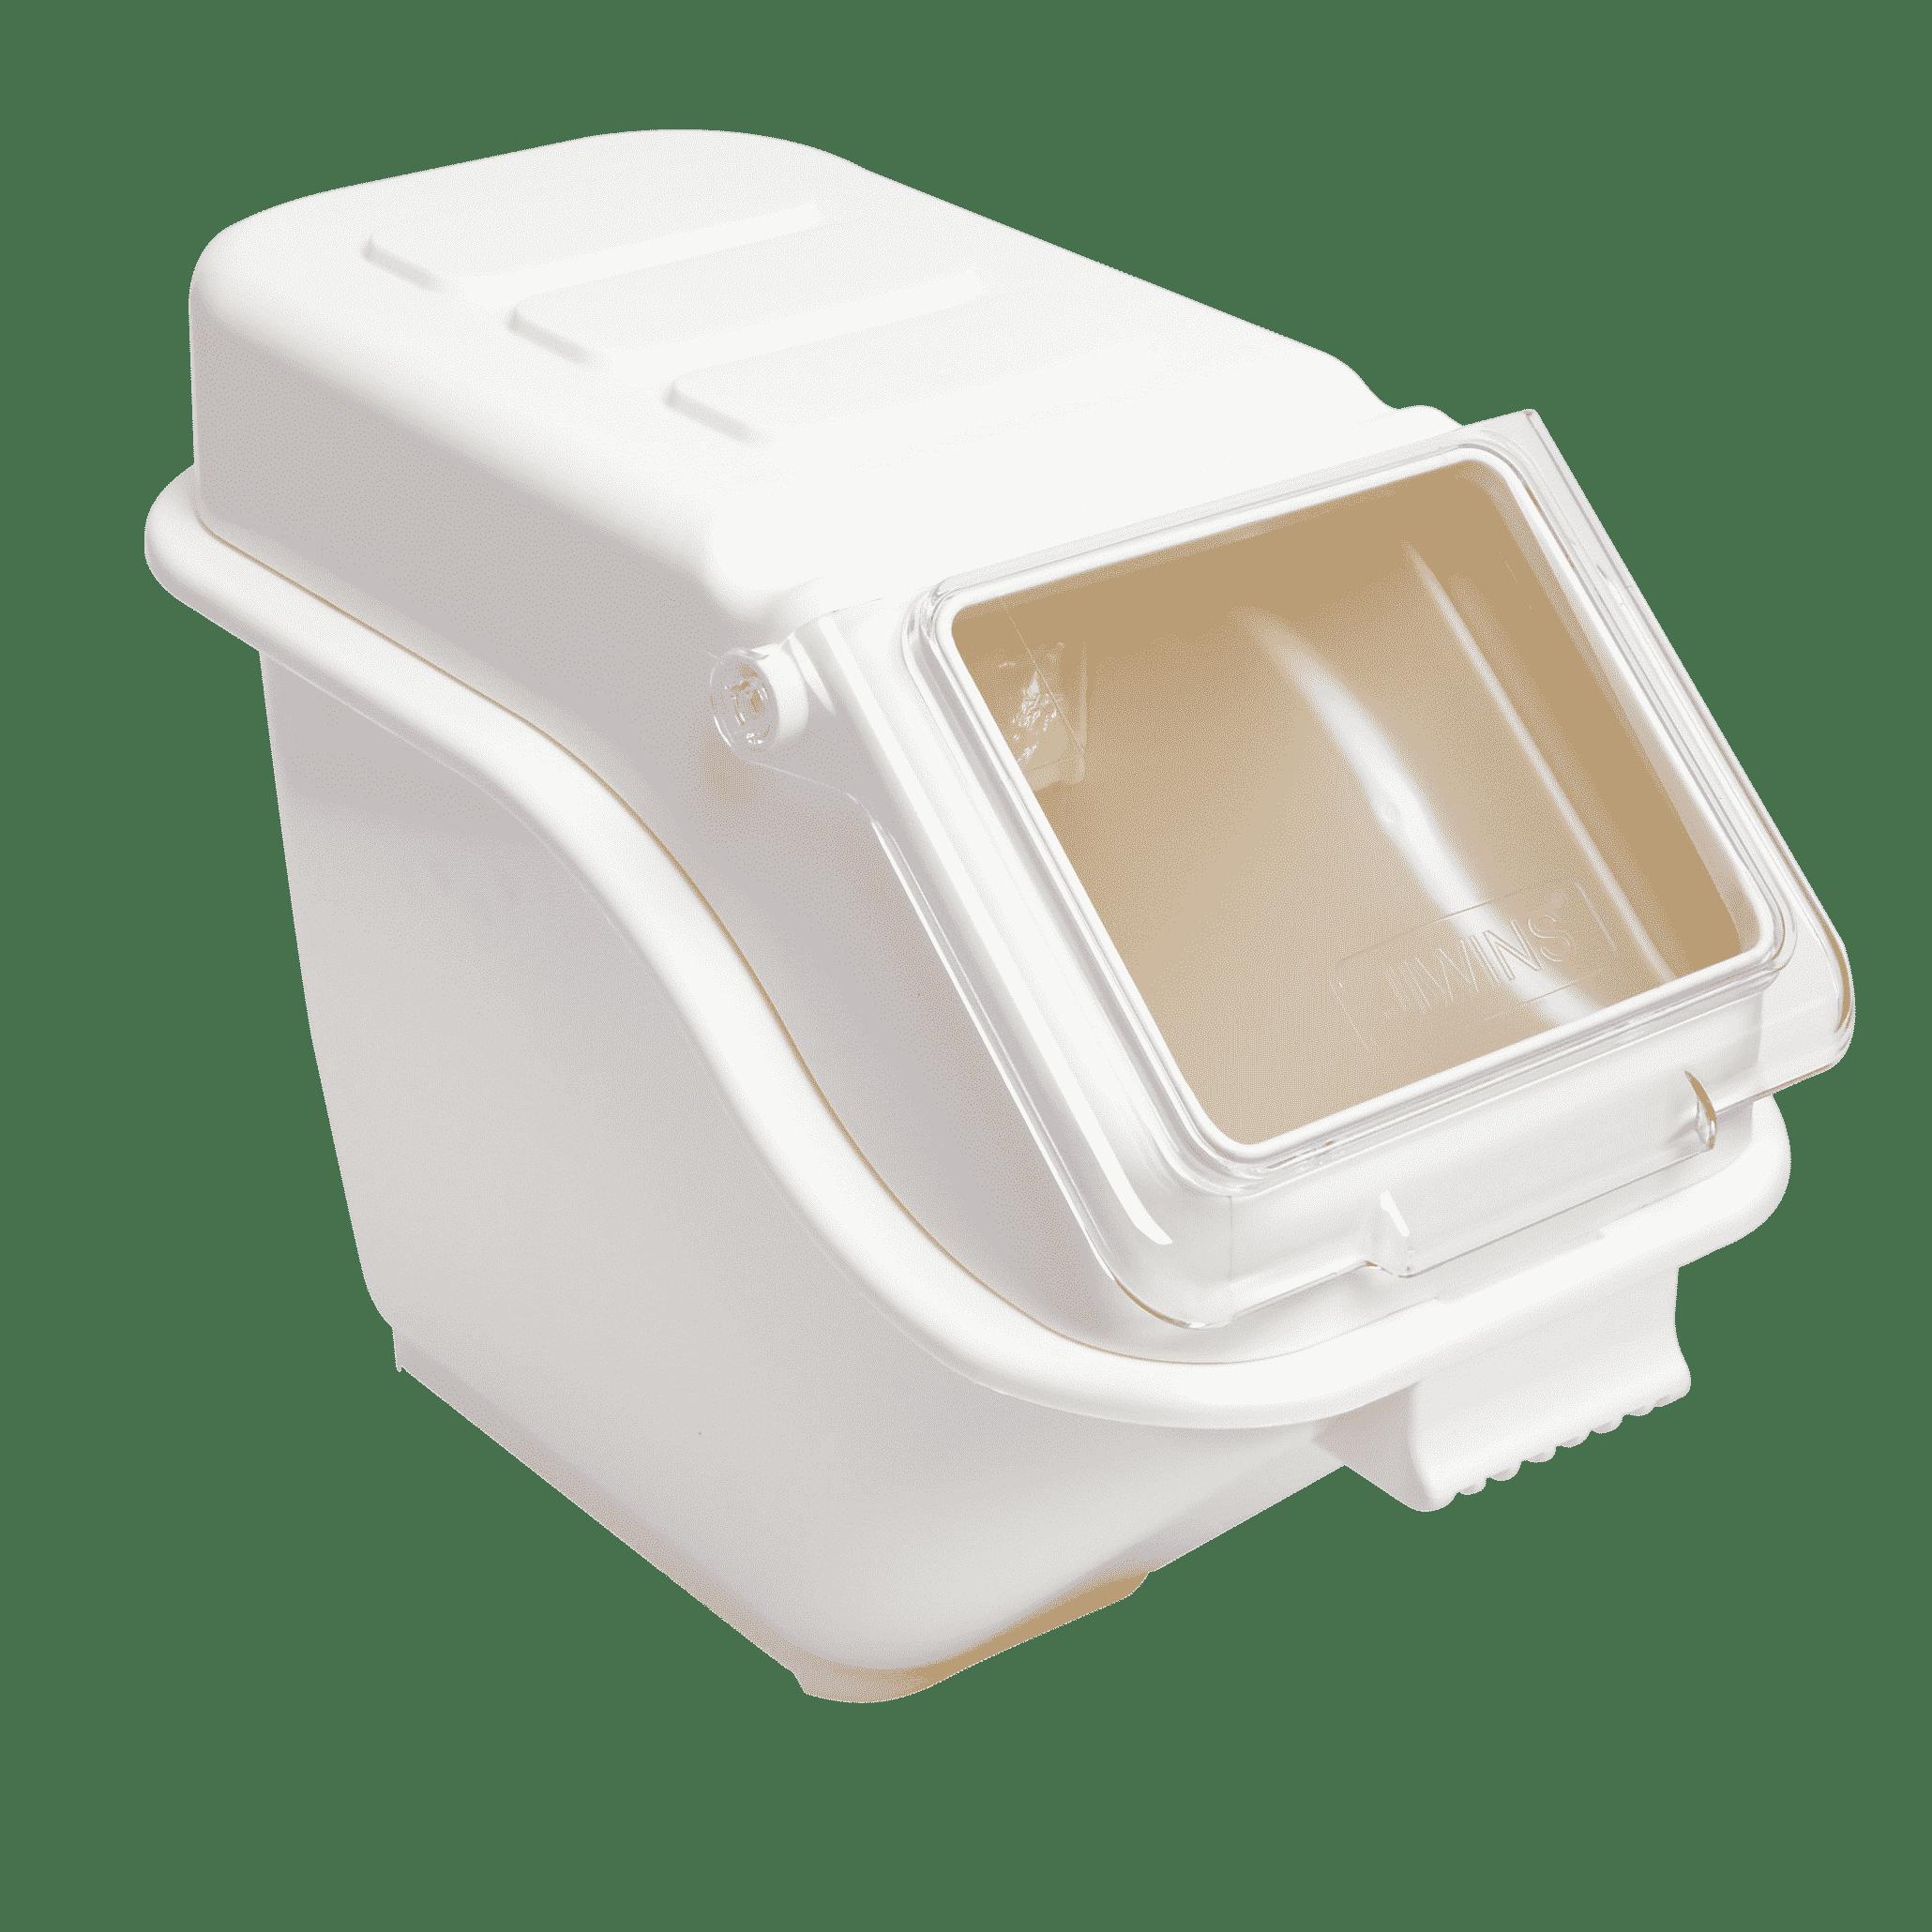 KH Shelf Ingredient Bin / Food Material 40lt